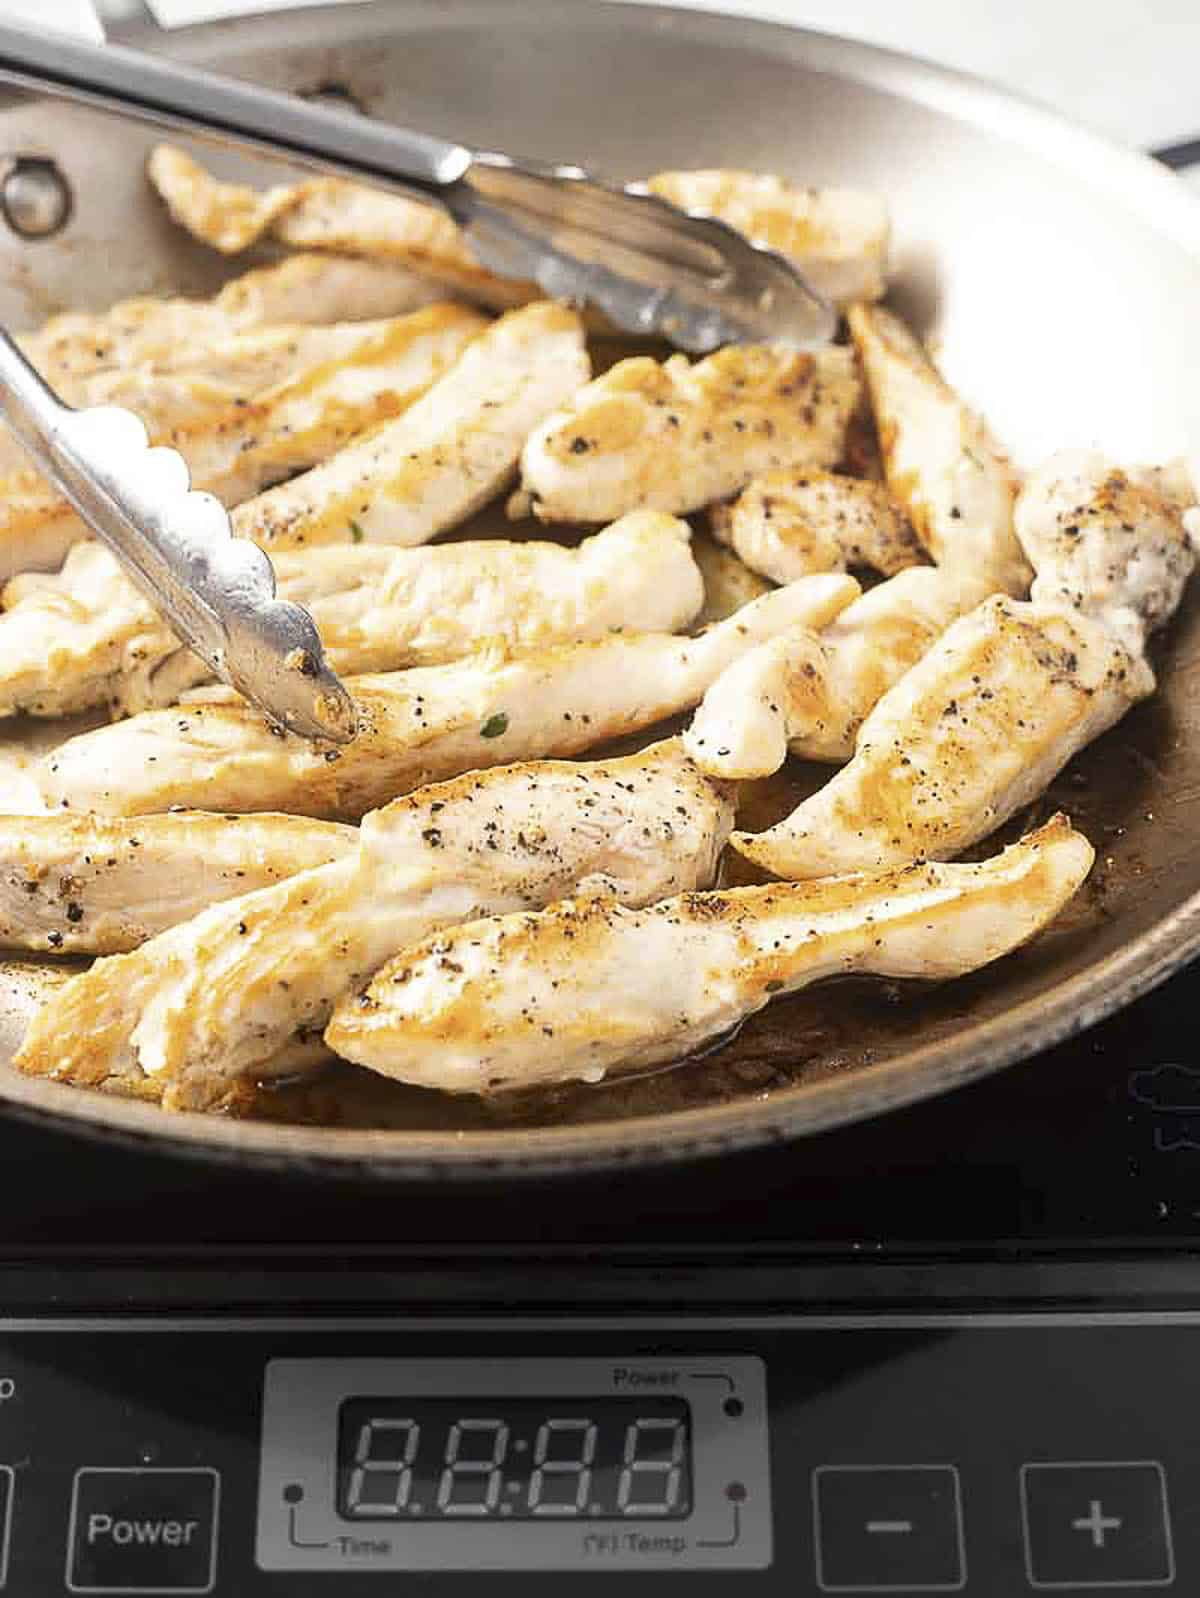 Sautéed chicken breast strips in a pan.